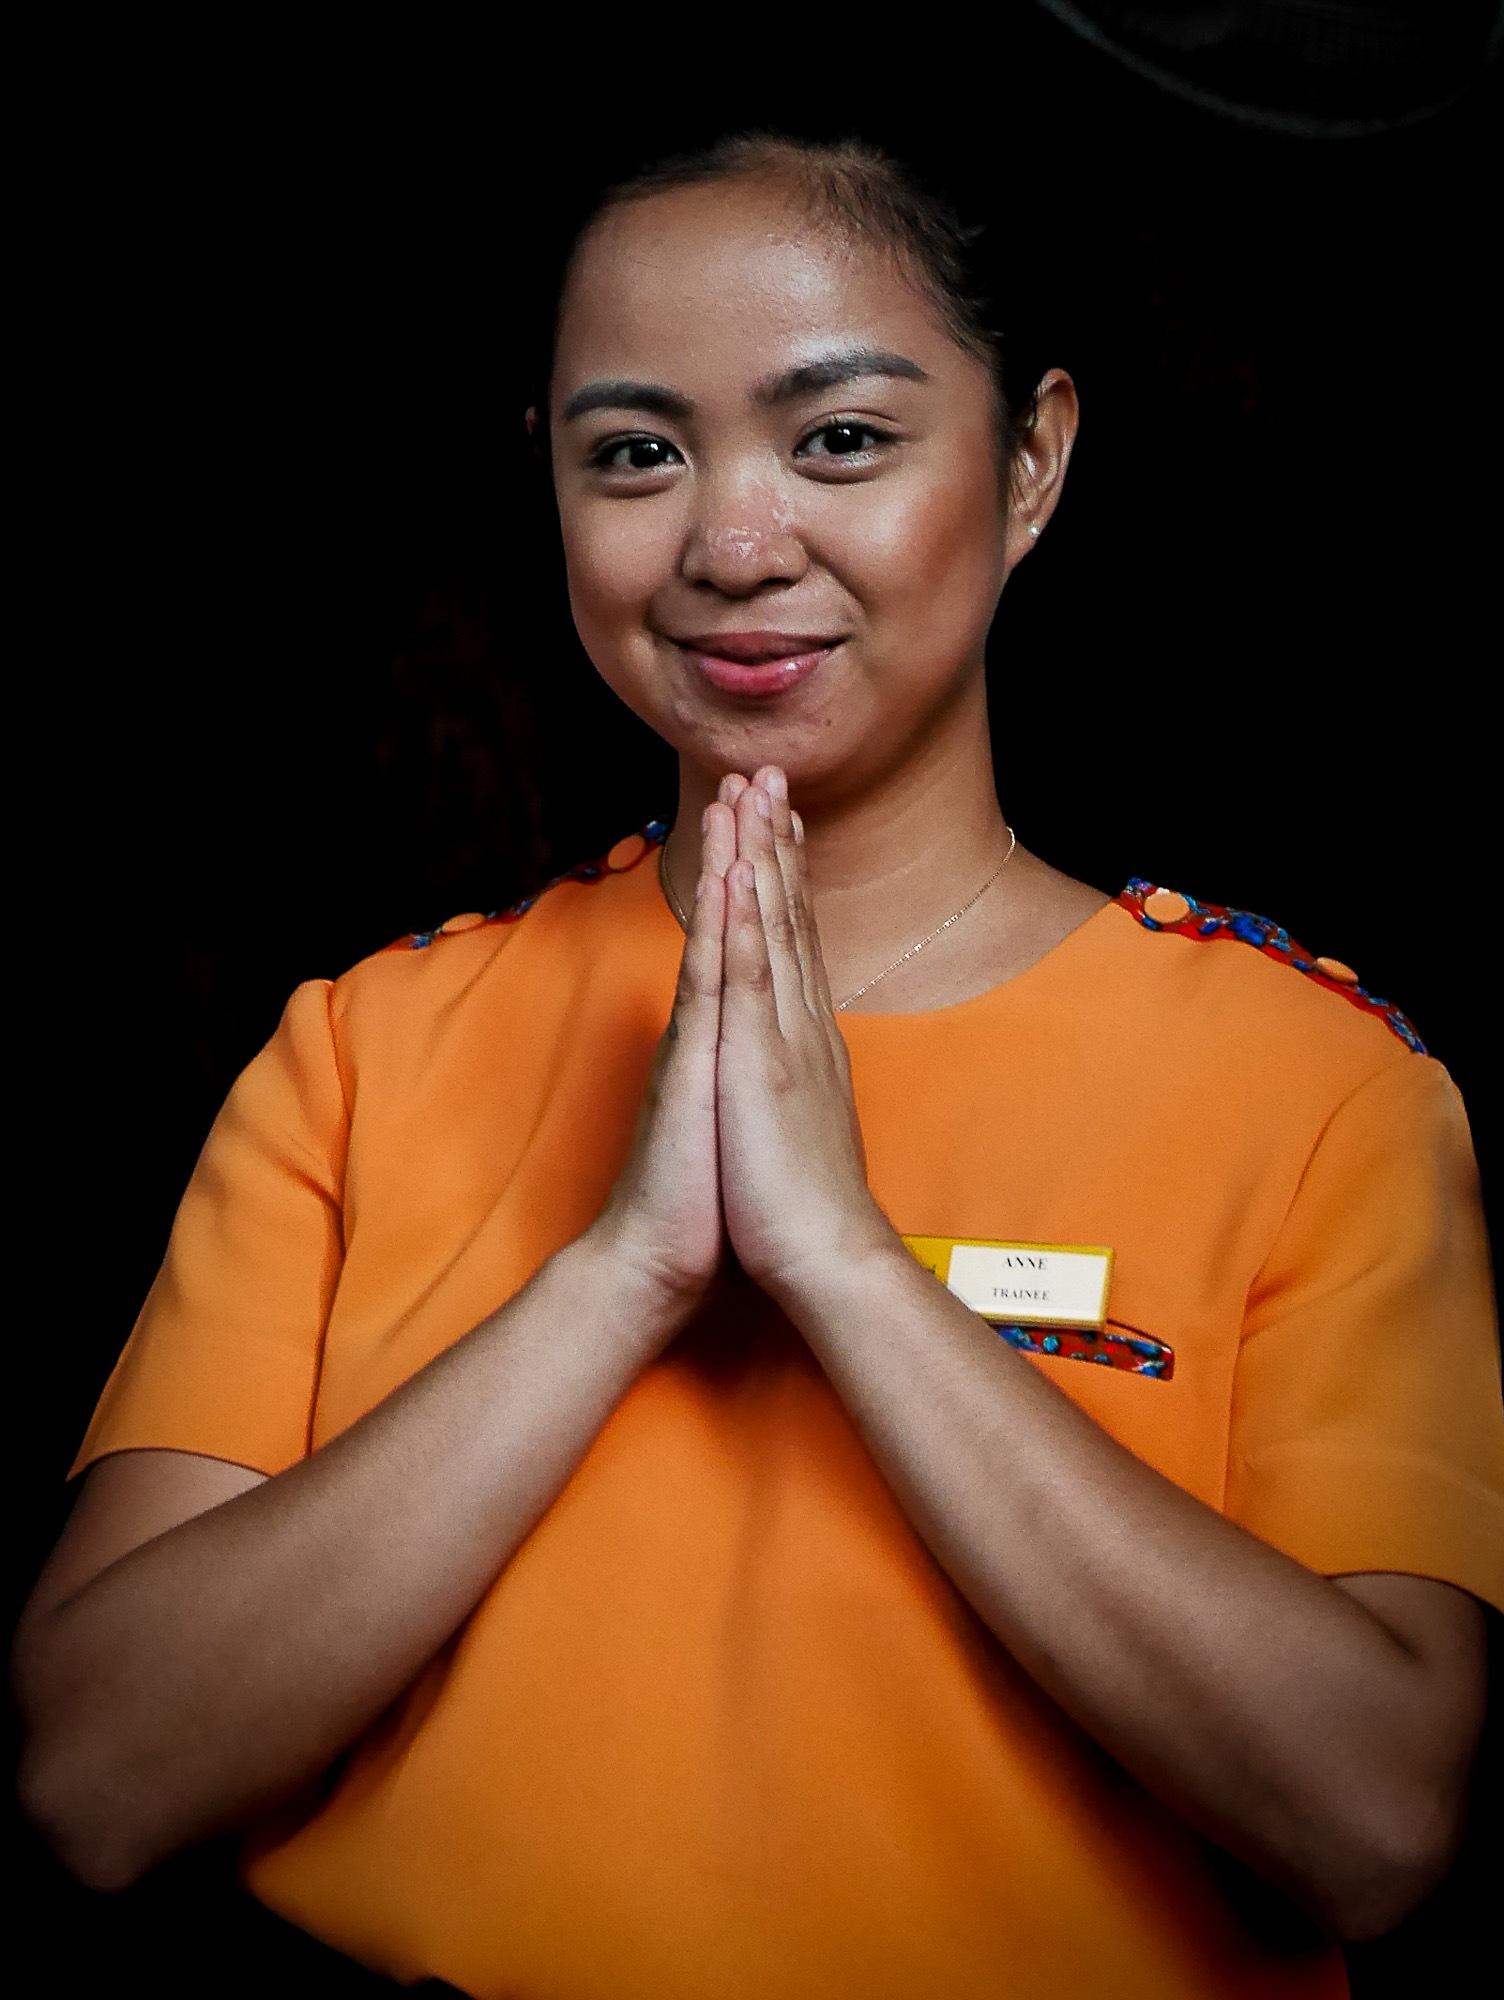 thai girl by tonyhart